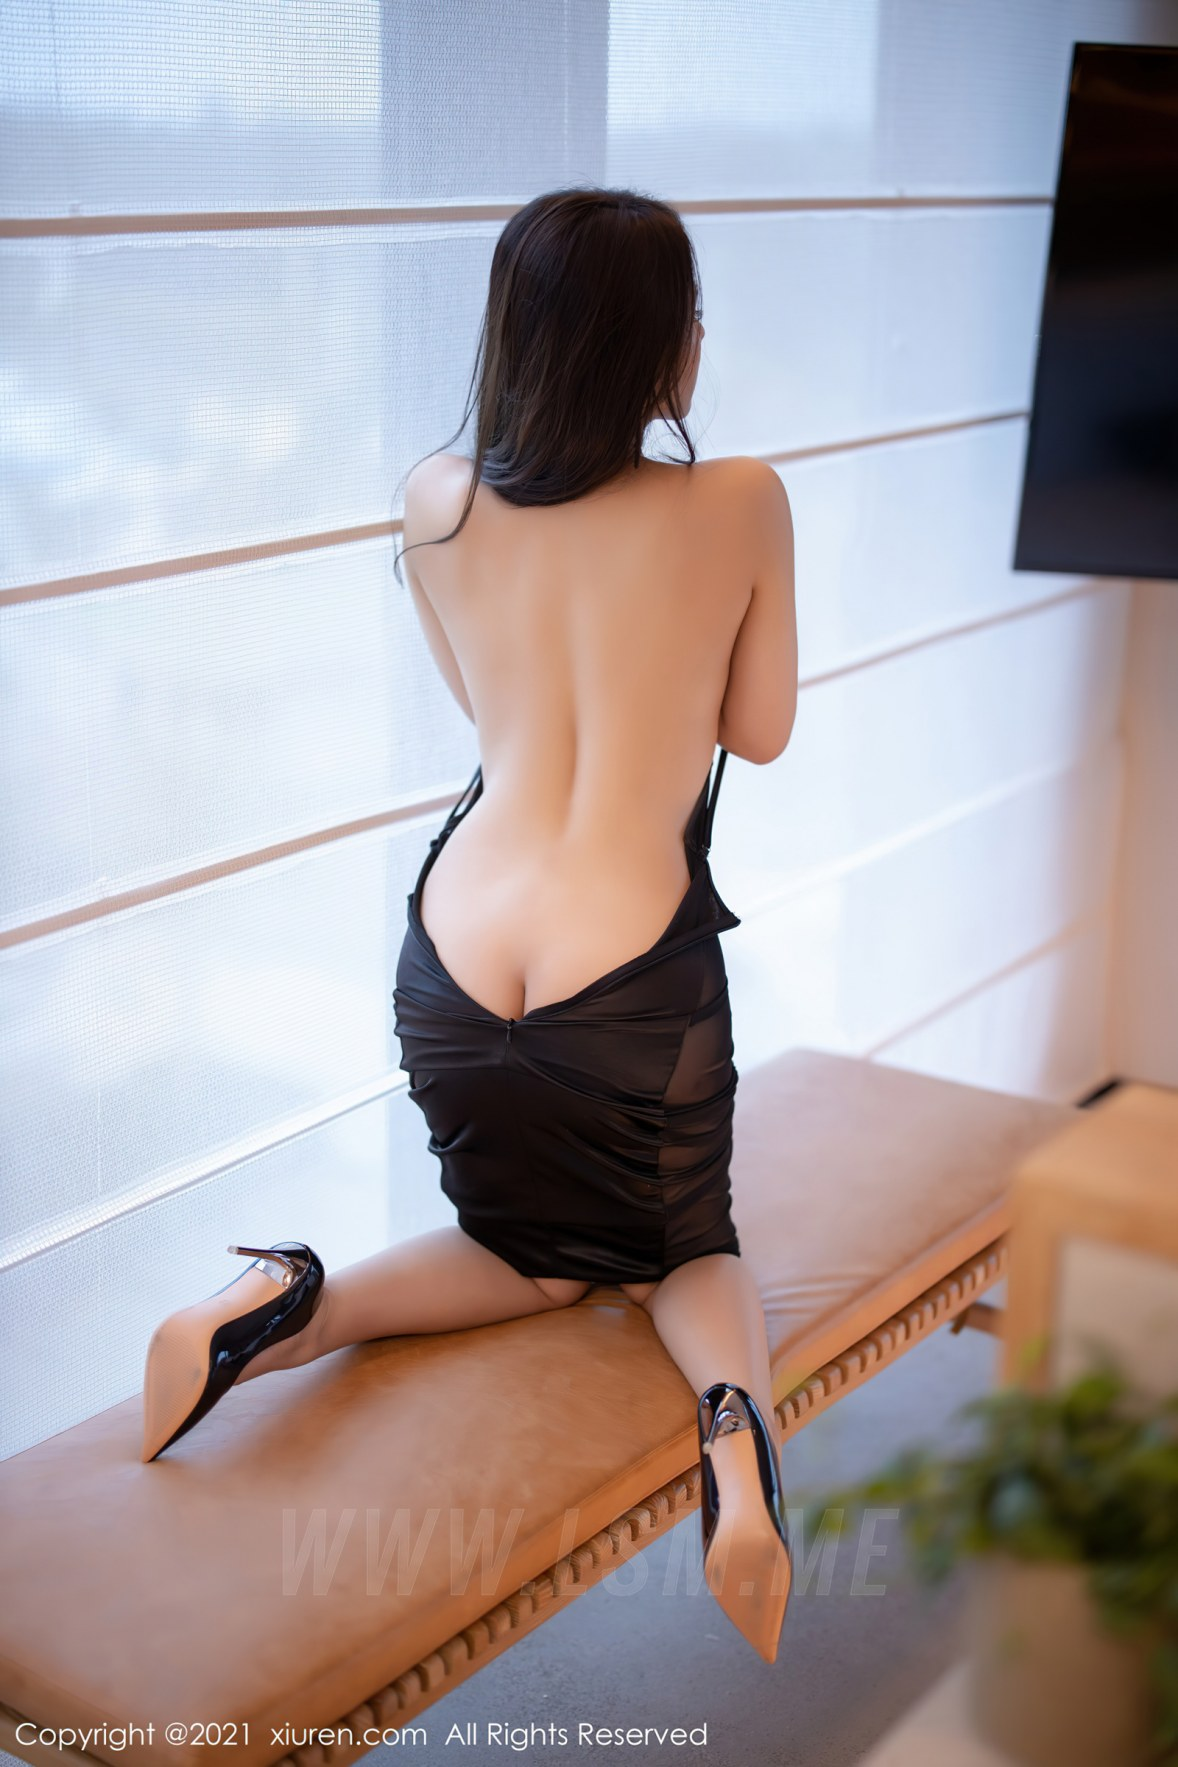 3465 035 4oq 3600 5400 - XiuRen 秀人 No.3465  黑色吊裙 徐安安 三亚旅拍写真 - 秀人网 -【免费在线写真】【丽人丝语】